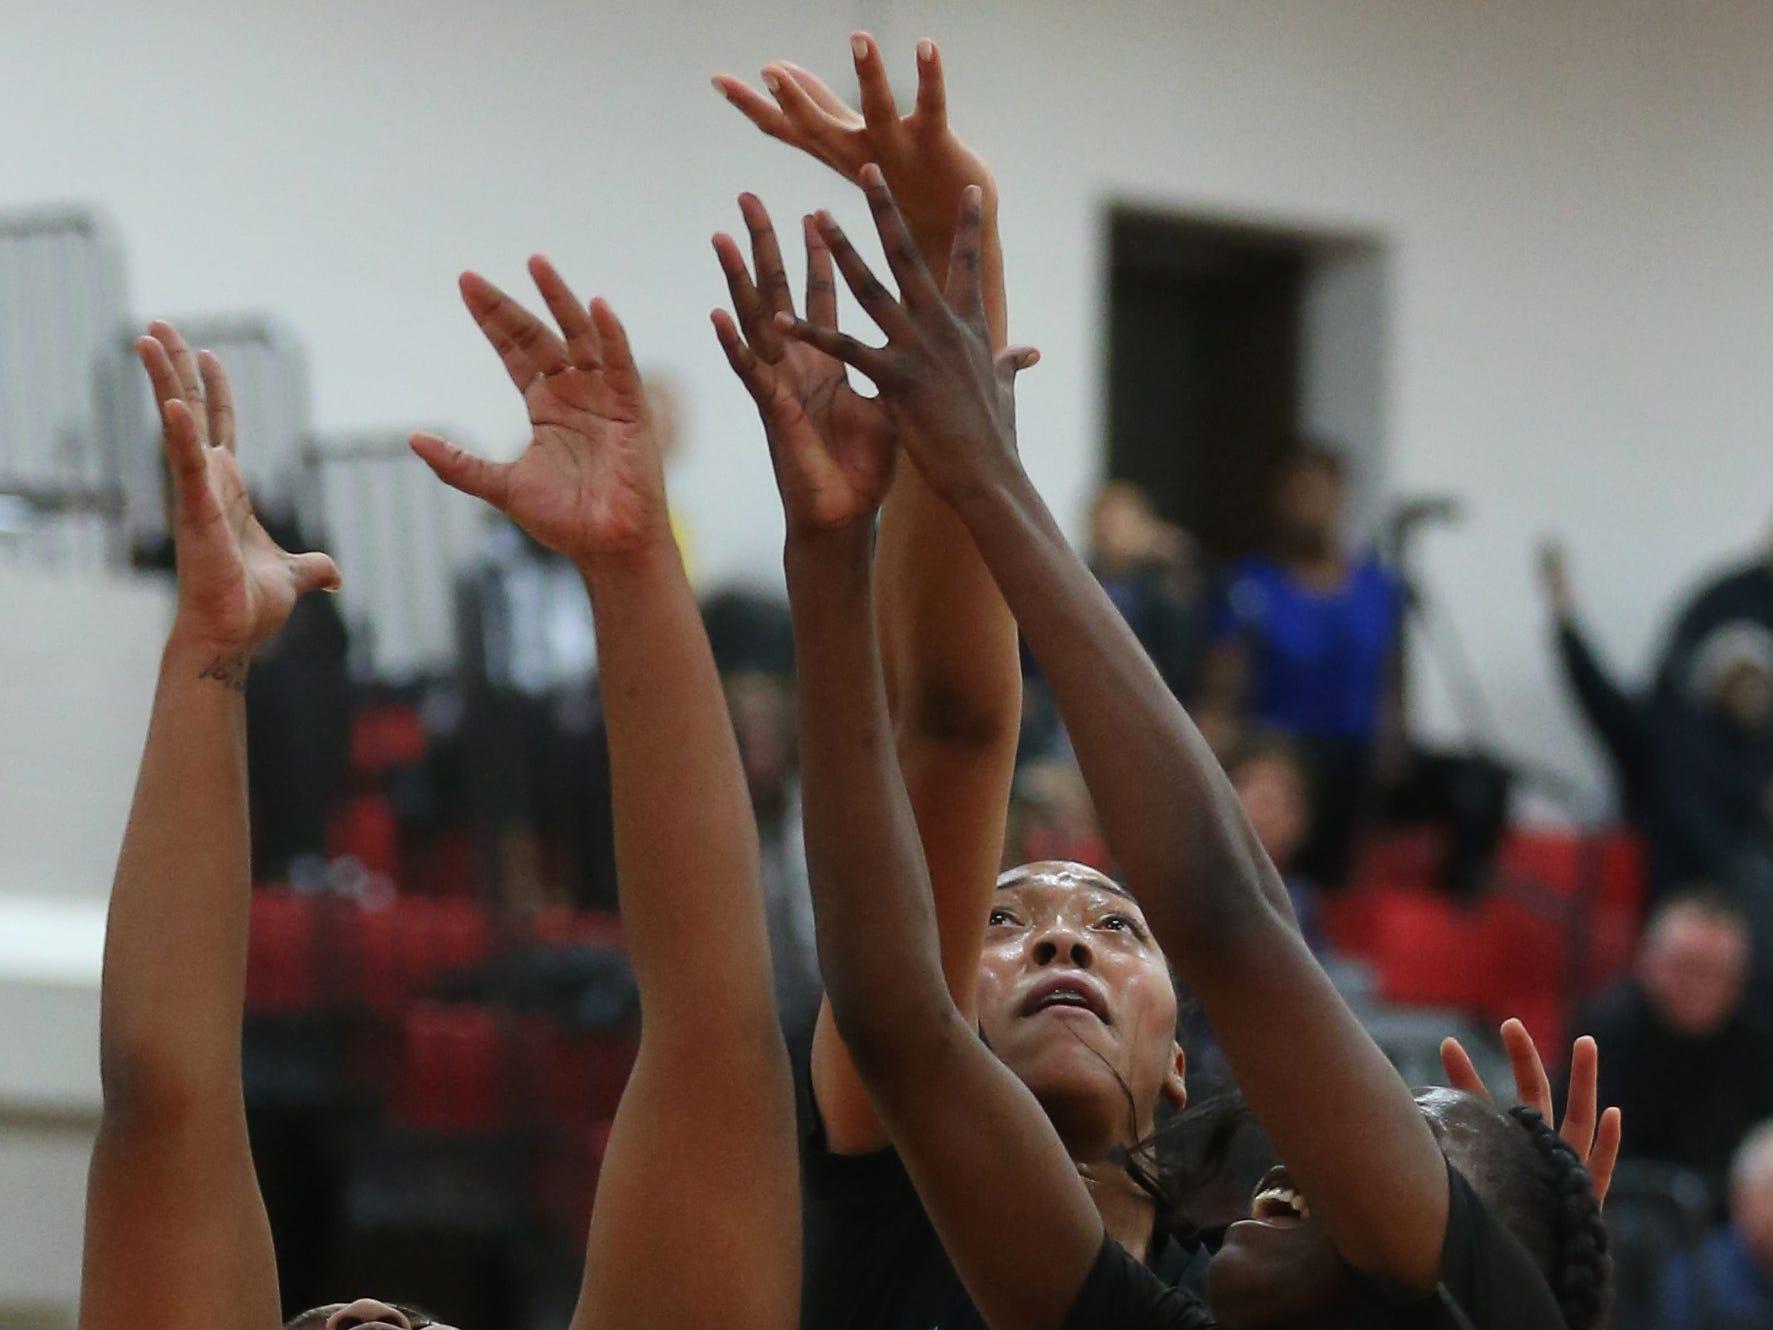 Kearney's Saniaa Wilson, center, gets a rebound over her teammate Lytoya Baker, right, and Penfield's Nyara Simmons, left.